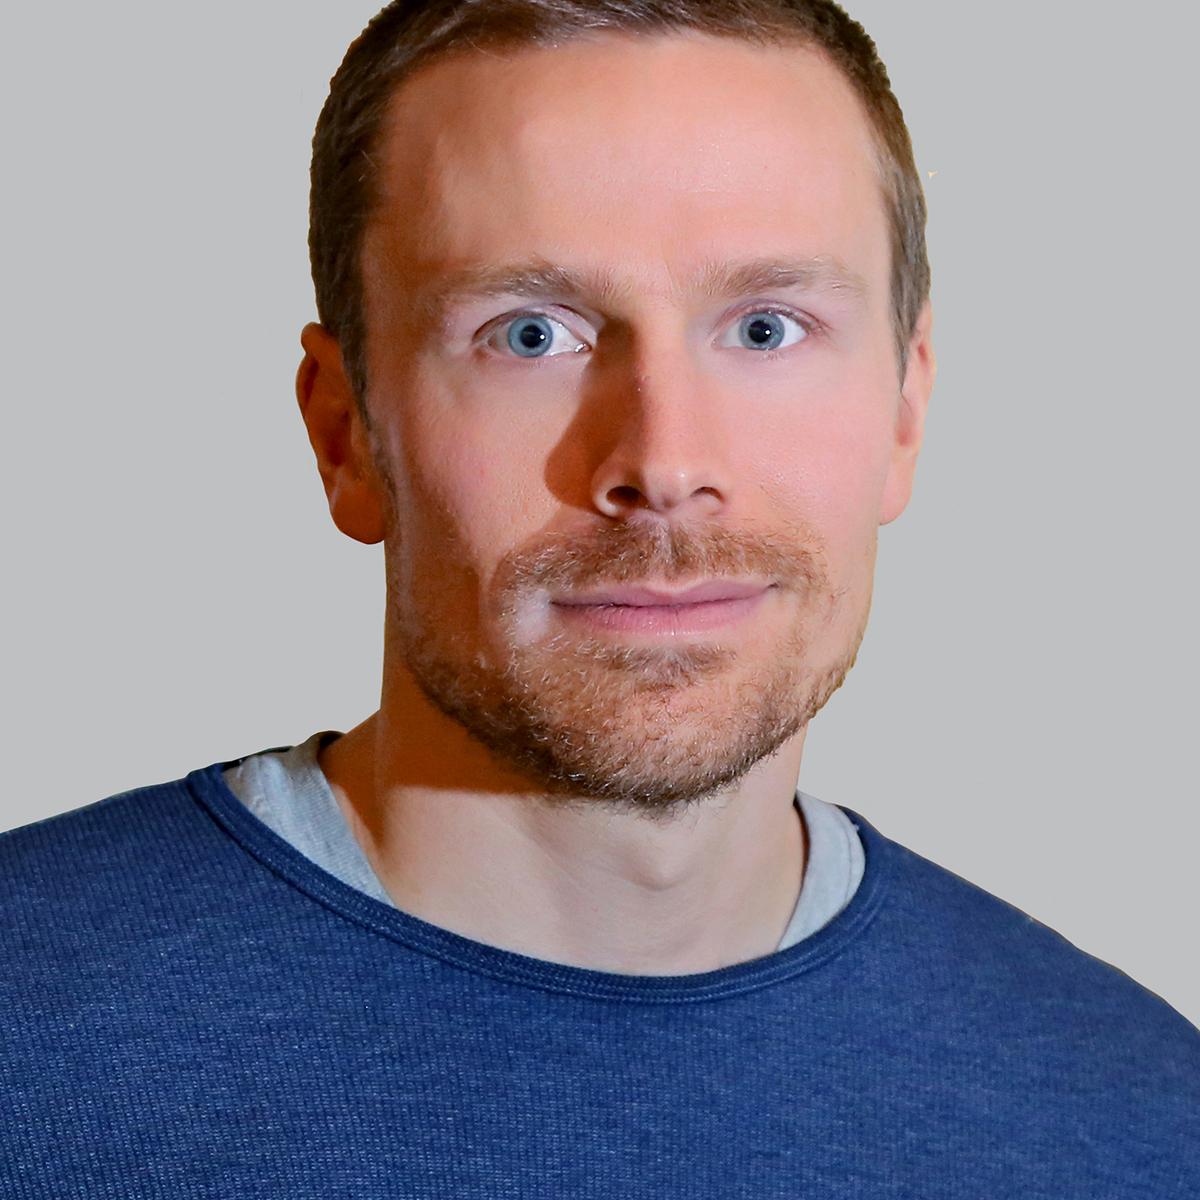 Andrew Berdahl